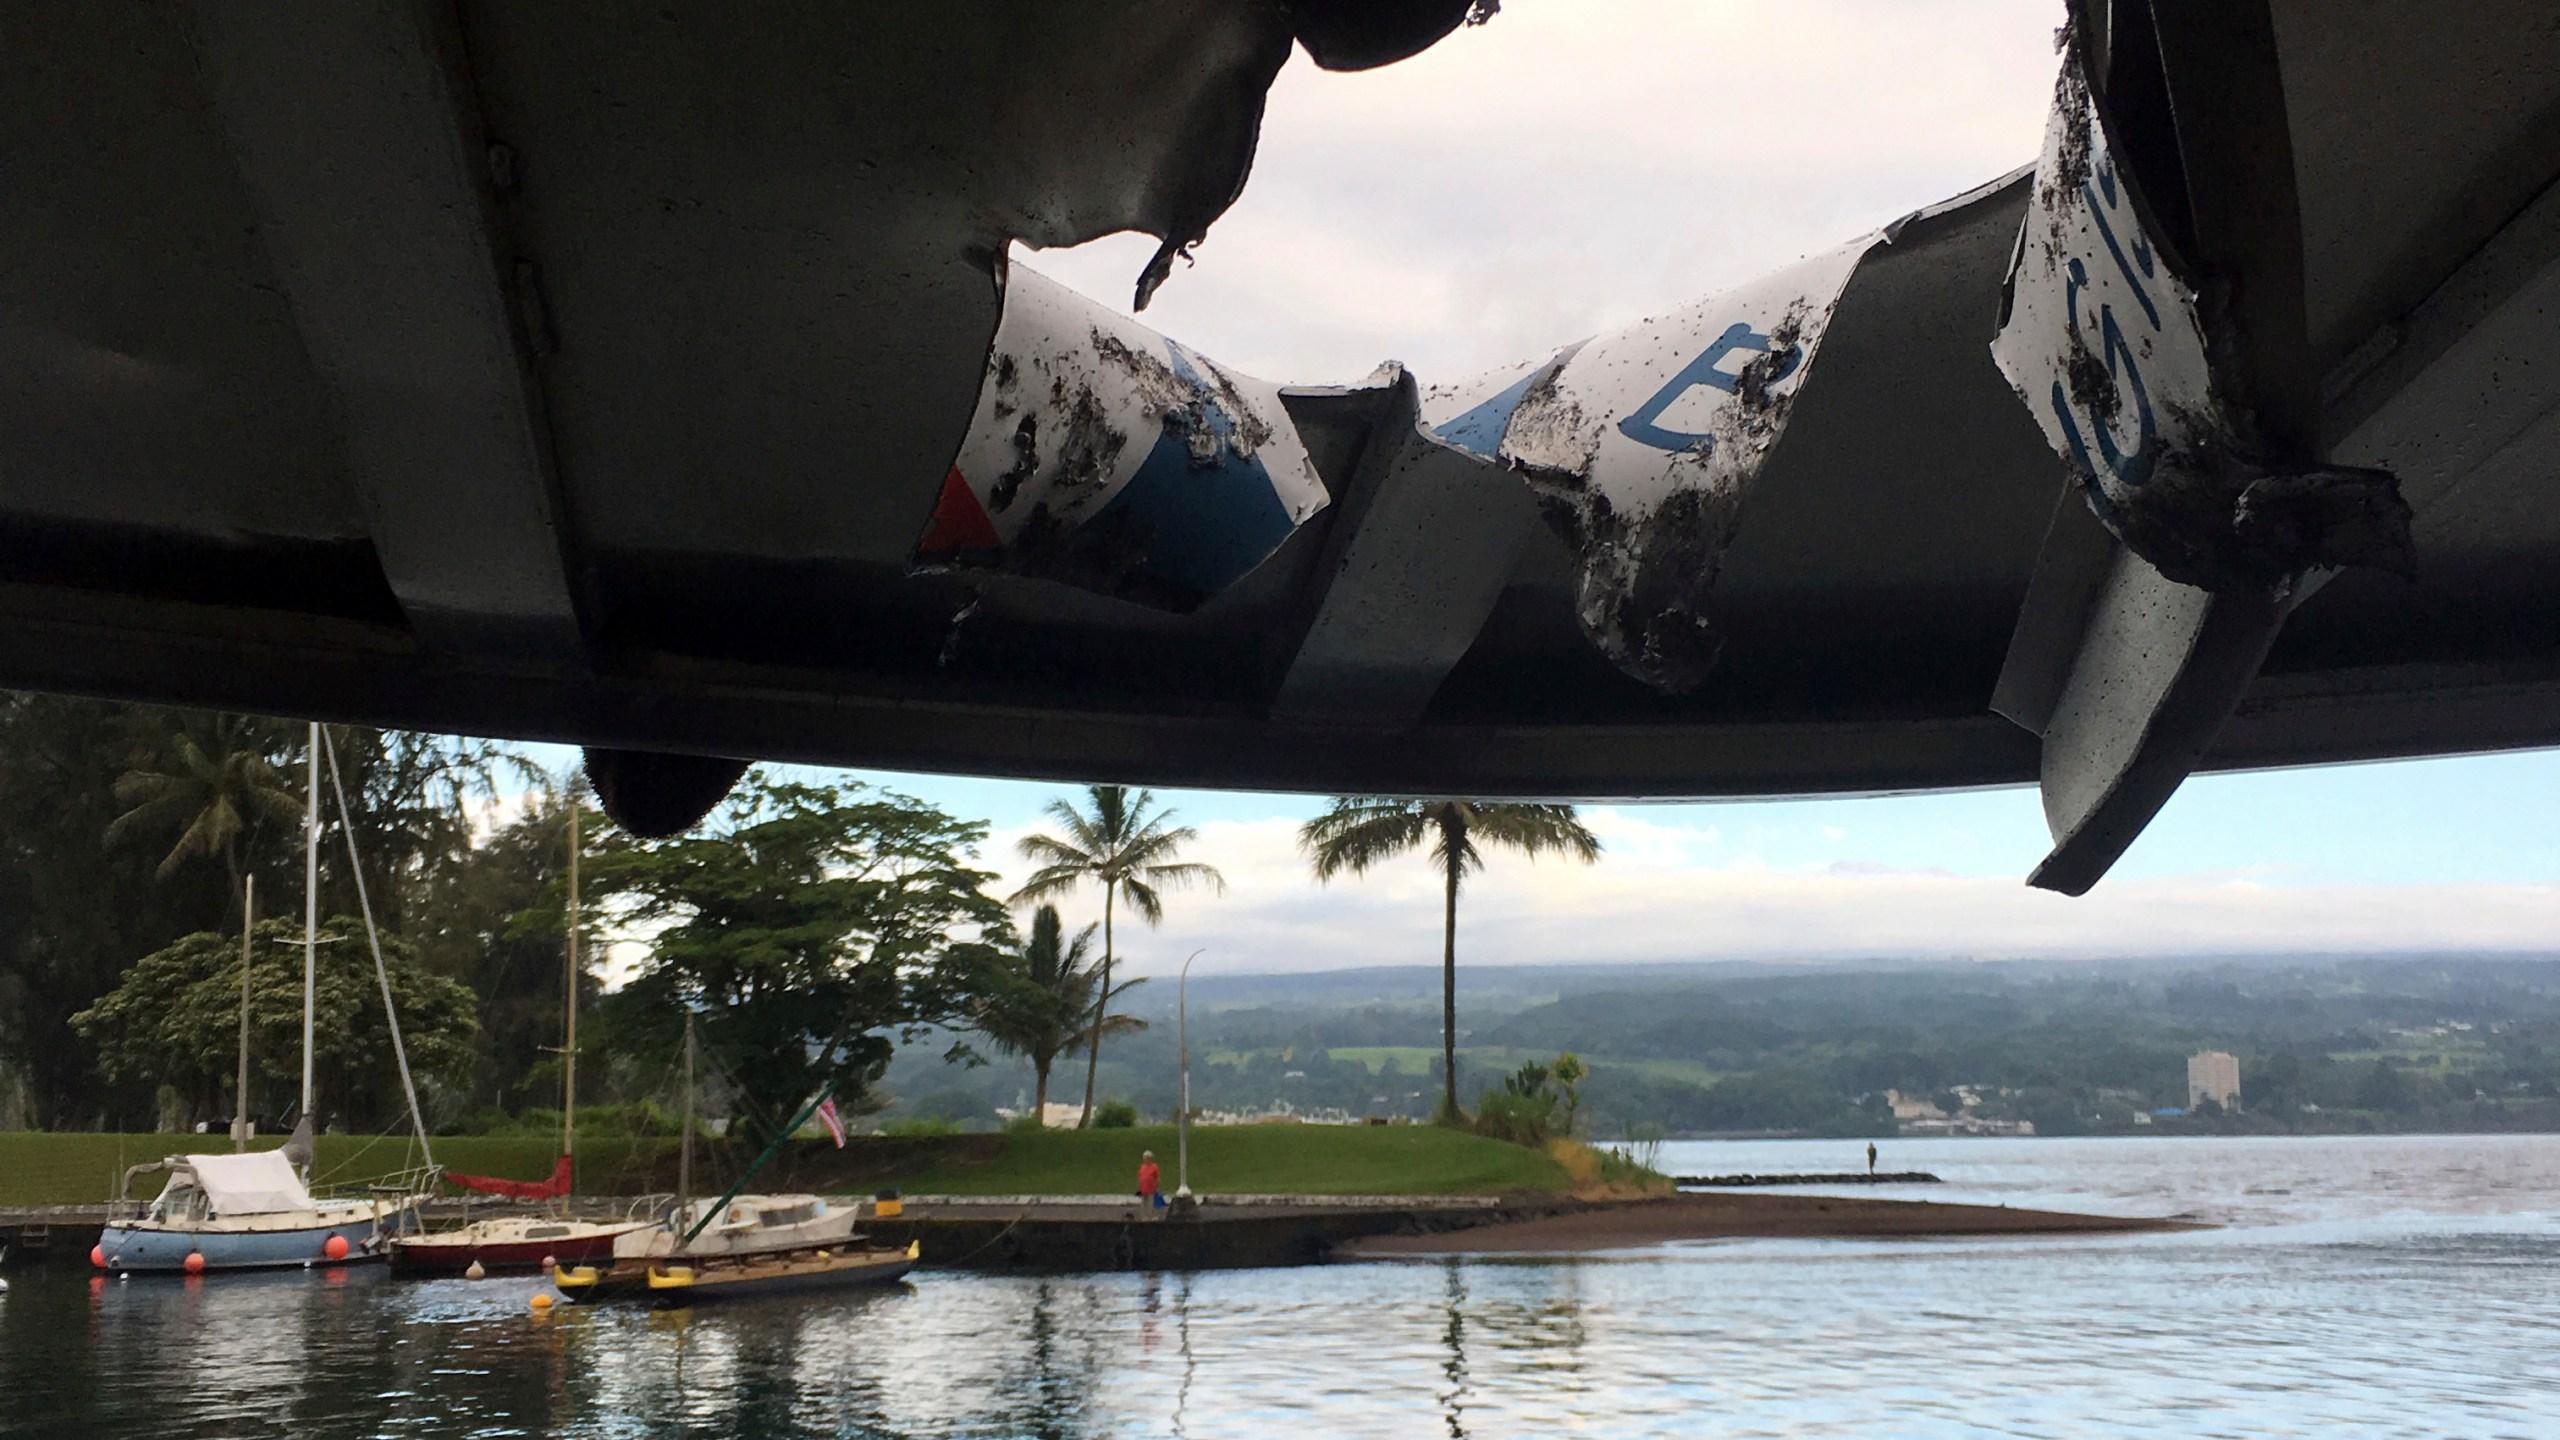 Hawaii_Volcano_Boat_Injuries_66617-159532.jpg58819395